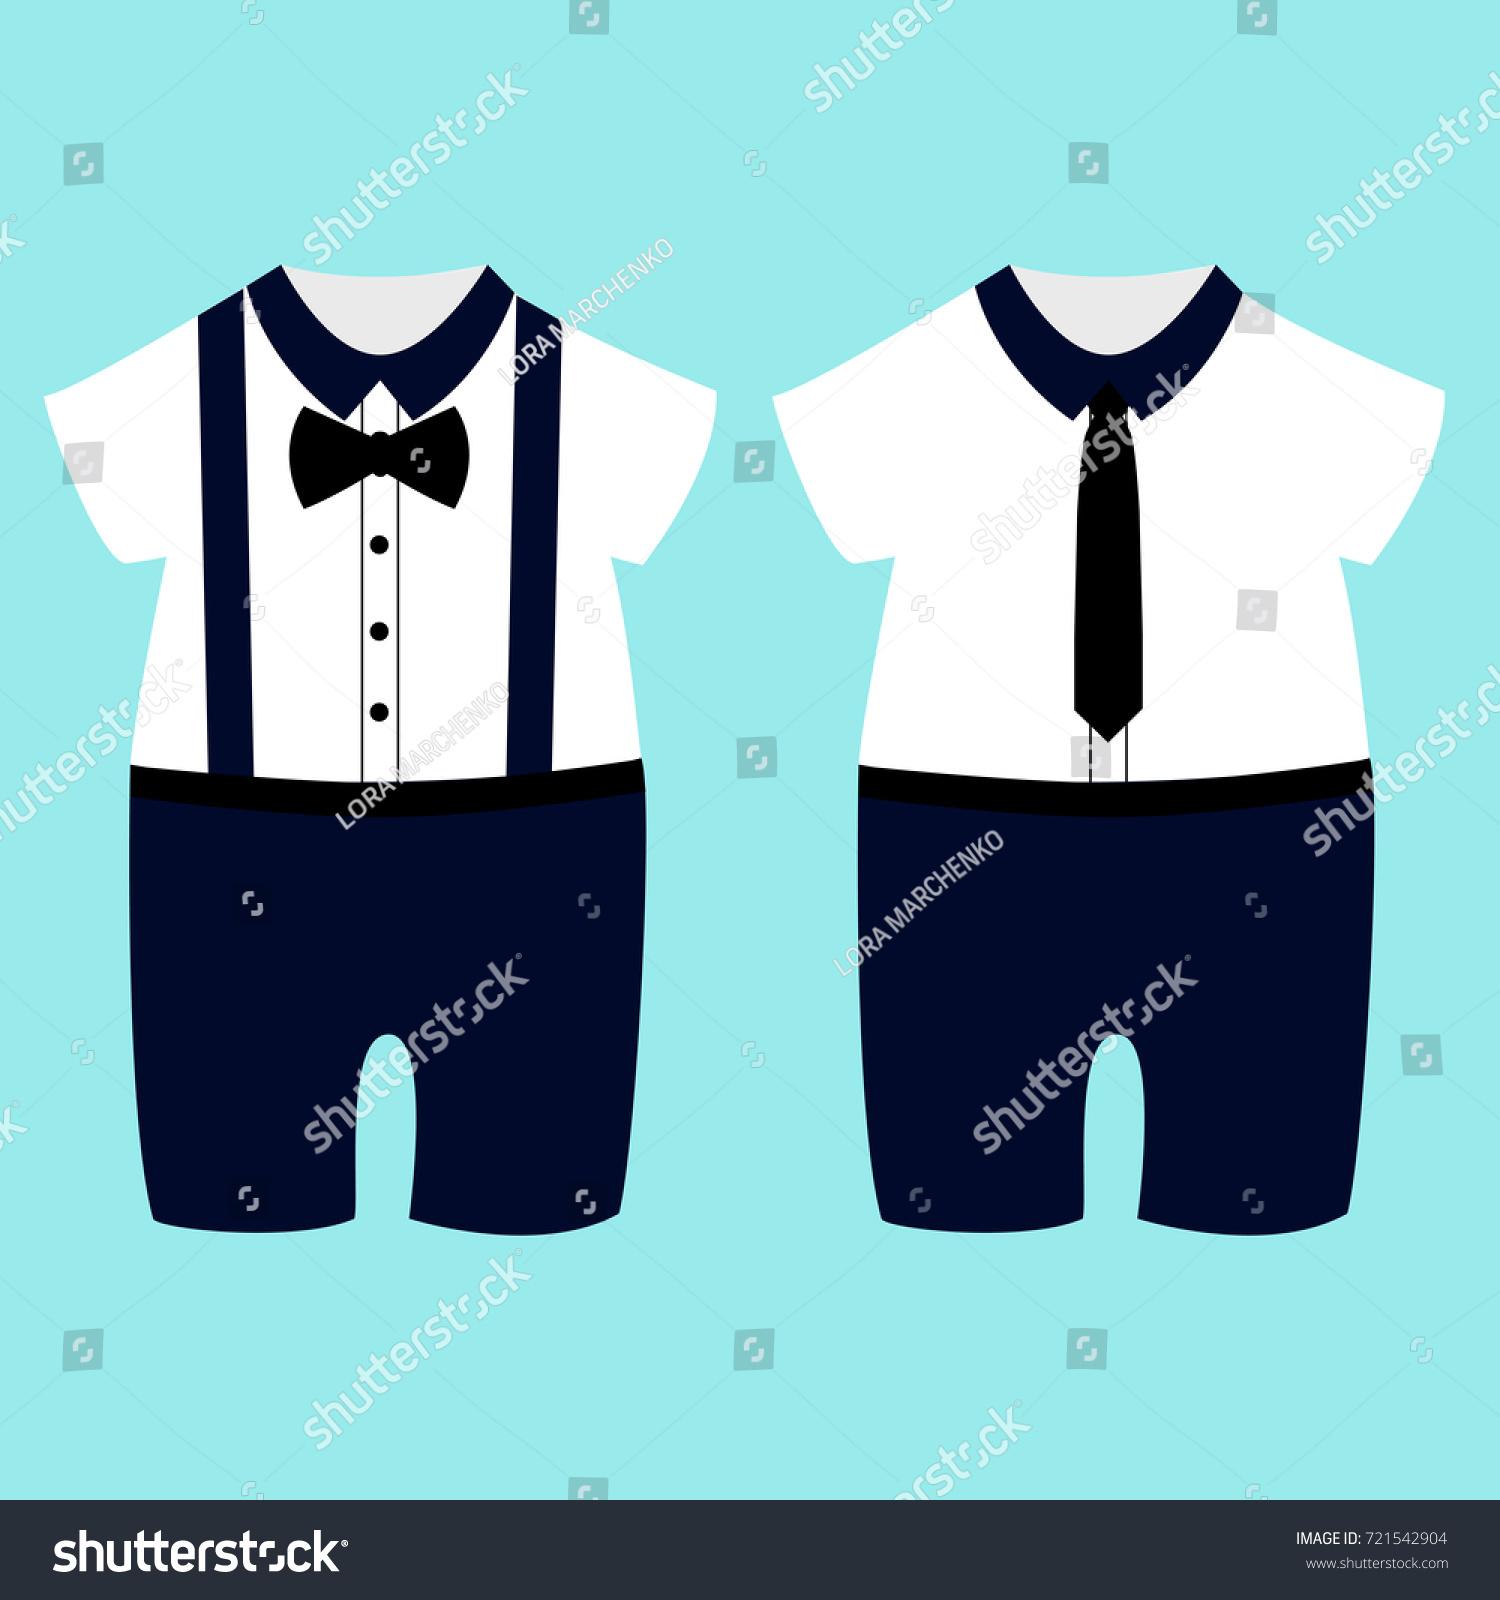 92593d0ce Romper Suit Childrens Tuxedo Boys Vector Stock Vector (Royalty Free ...